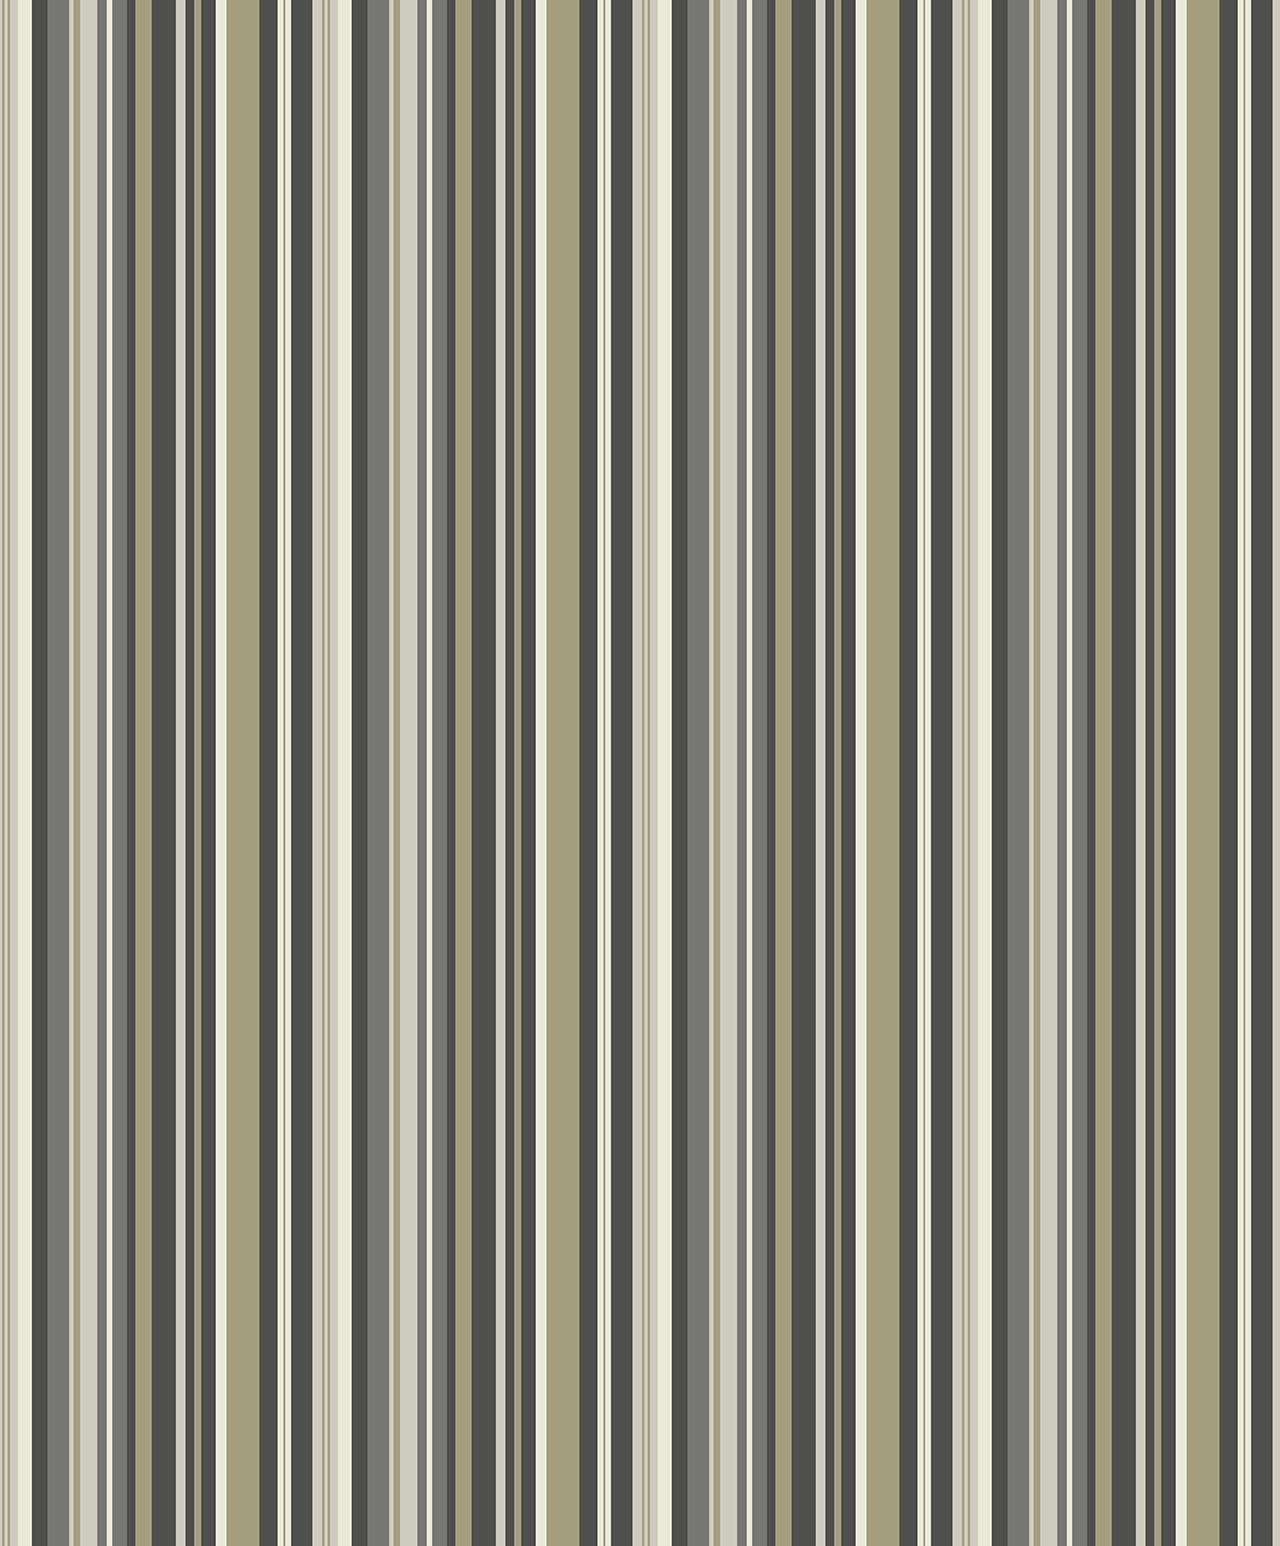 BARCODE SAGE A decadence wallpaper-DC00184